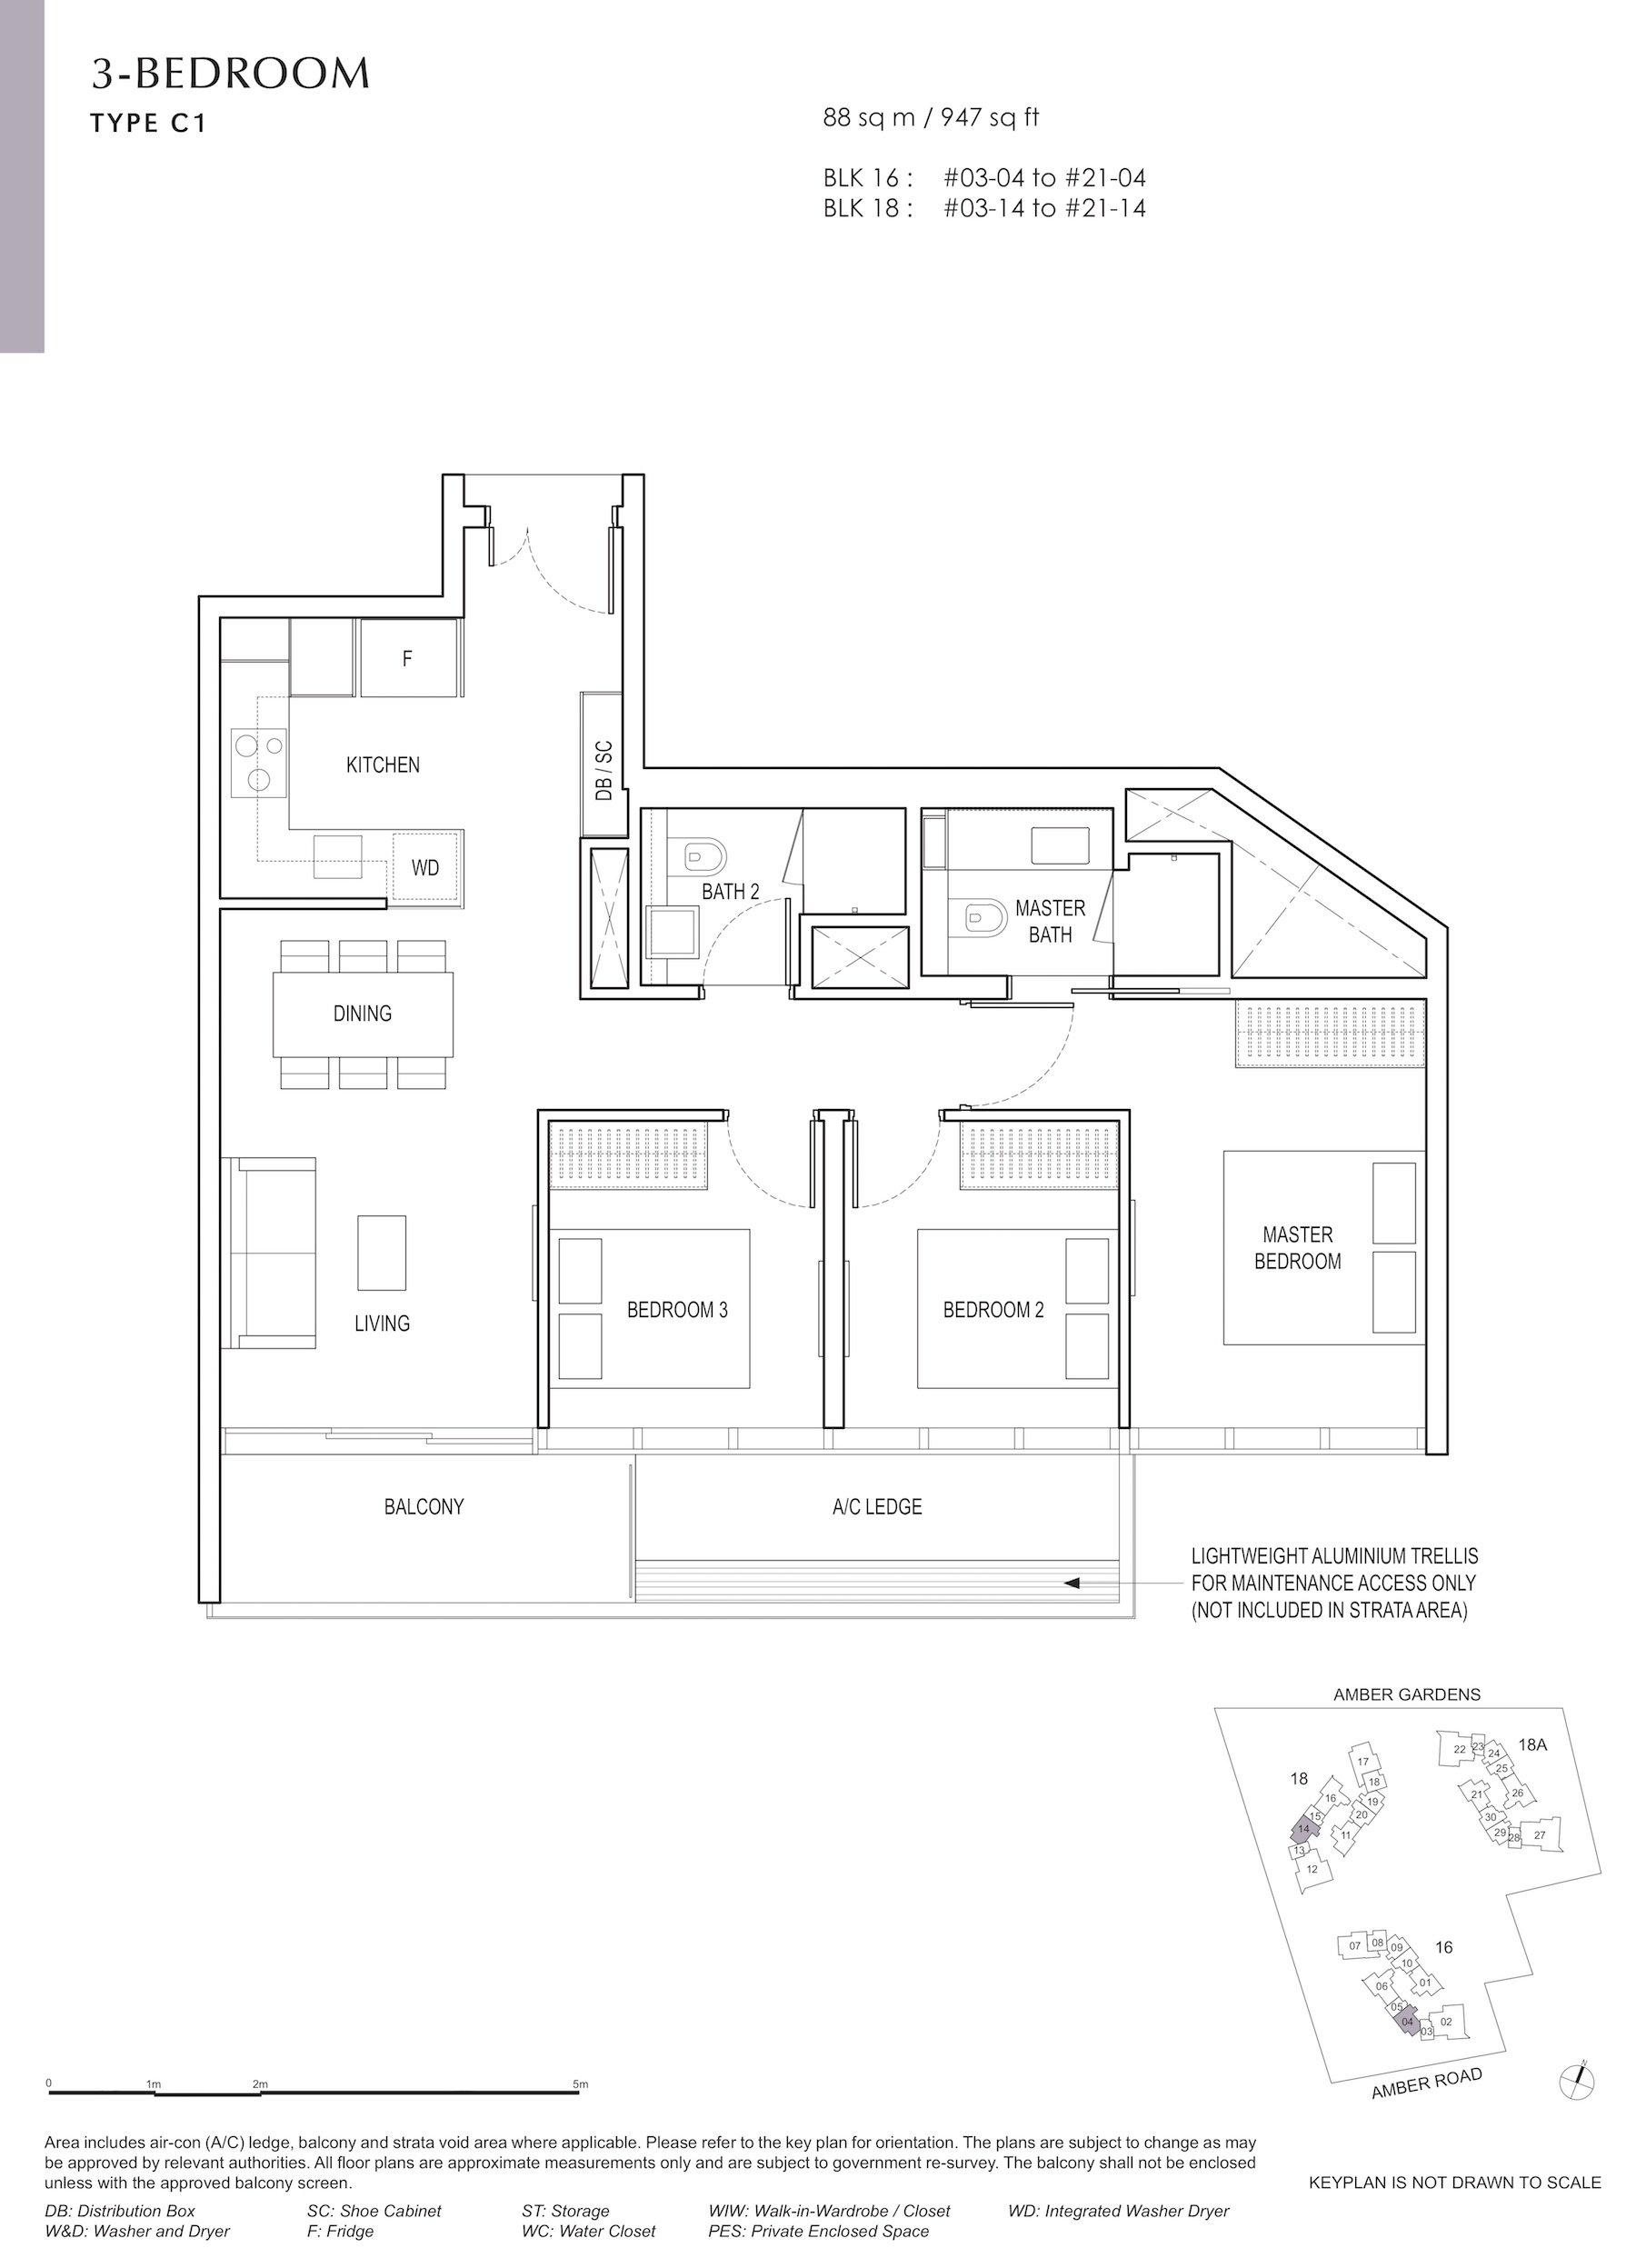 Amber Park 安铂苑 floor plan 3 bedroom 3卧房 C1